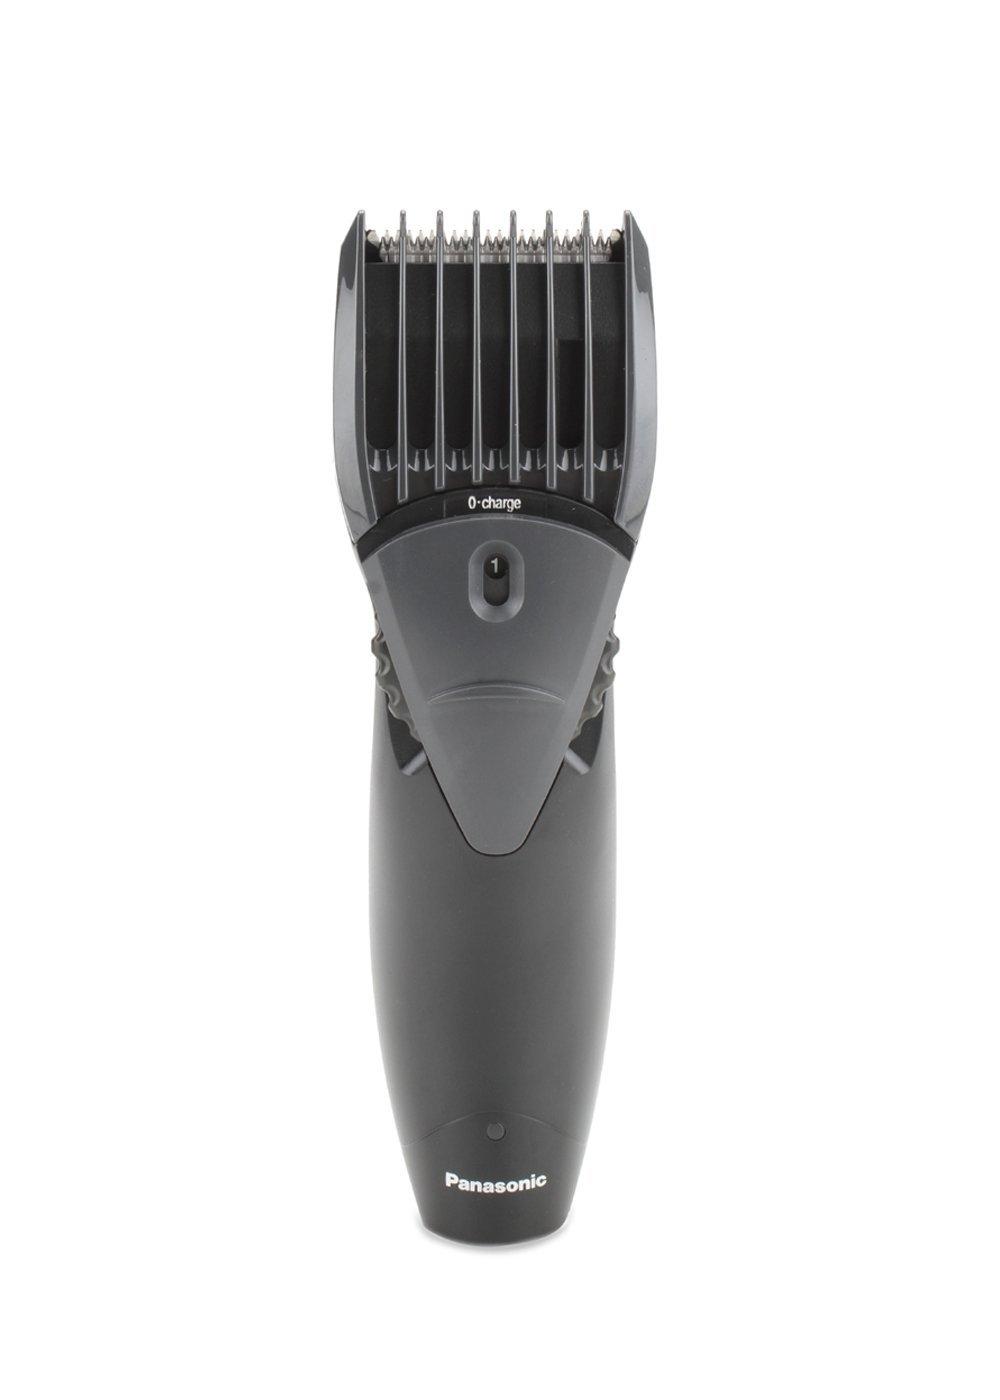 Panasonic ER-207-WK-44B Men's Beard and Hair Trimmer (Black) product image